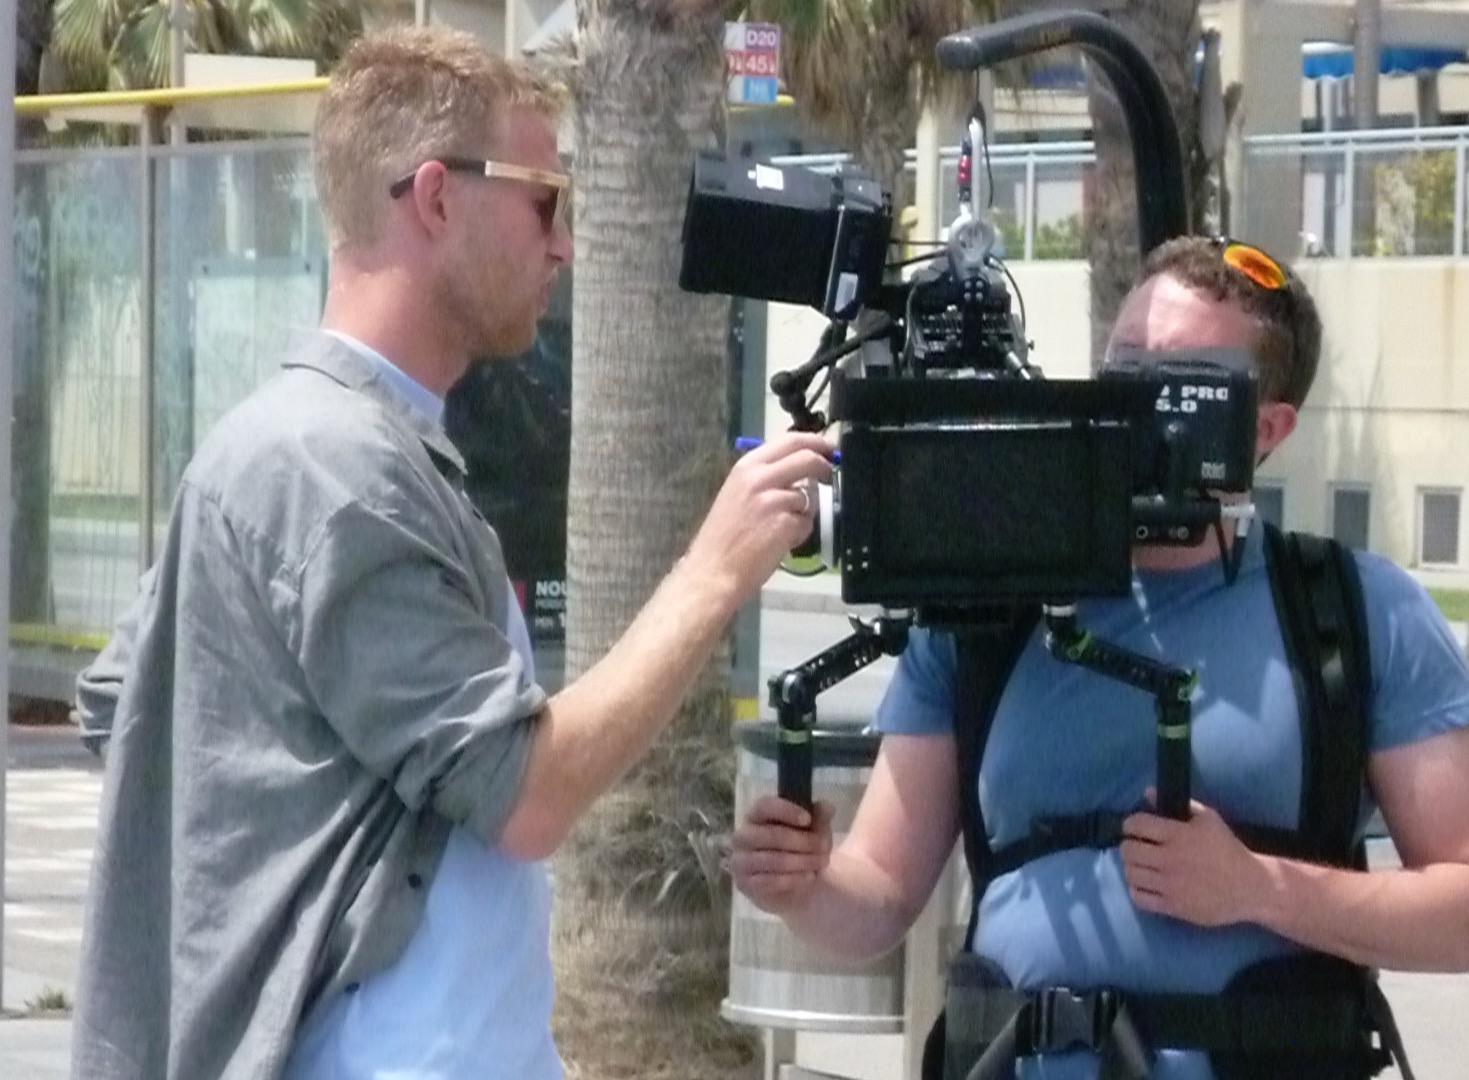 Music Video shooting